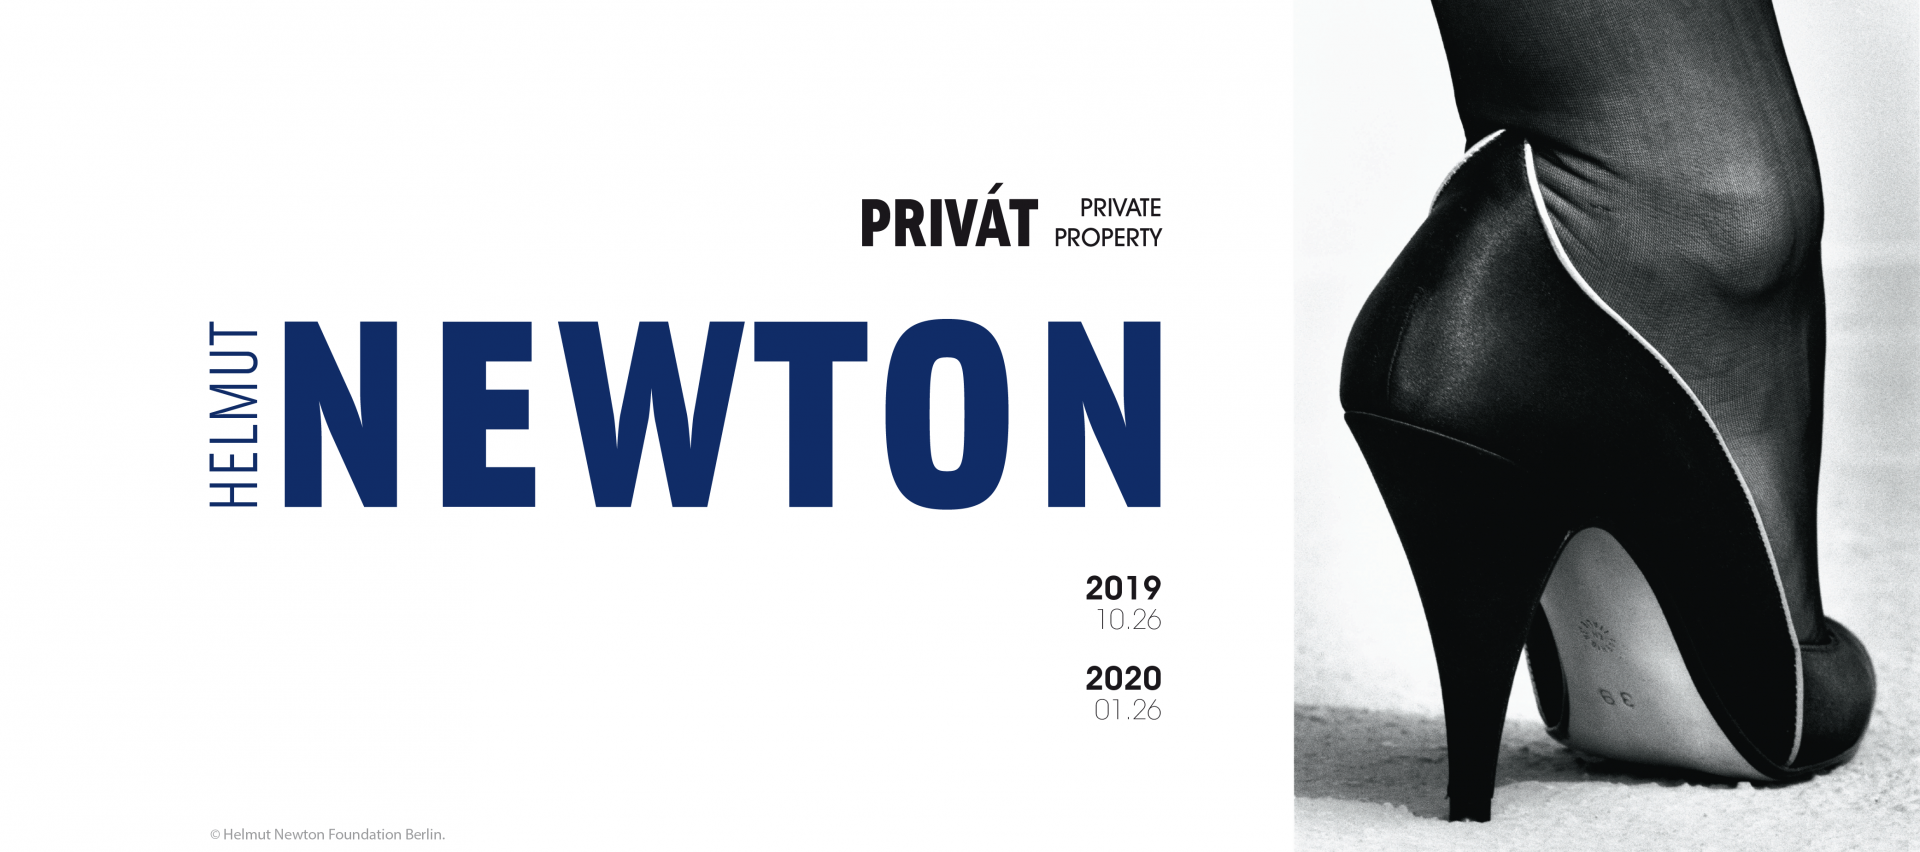 Private Property. Helmut Newton - DEBRECEN (Ungheria) MODERN AND CONTEMPORARY ARTS CENTRE (MODEM)